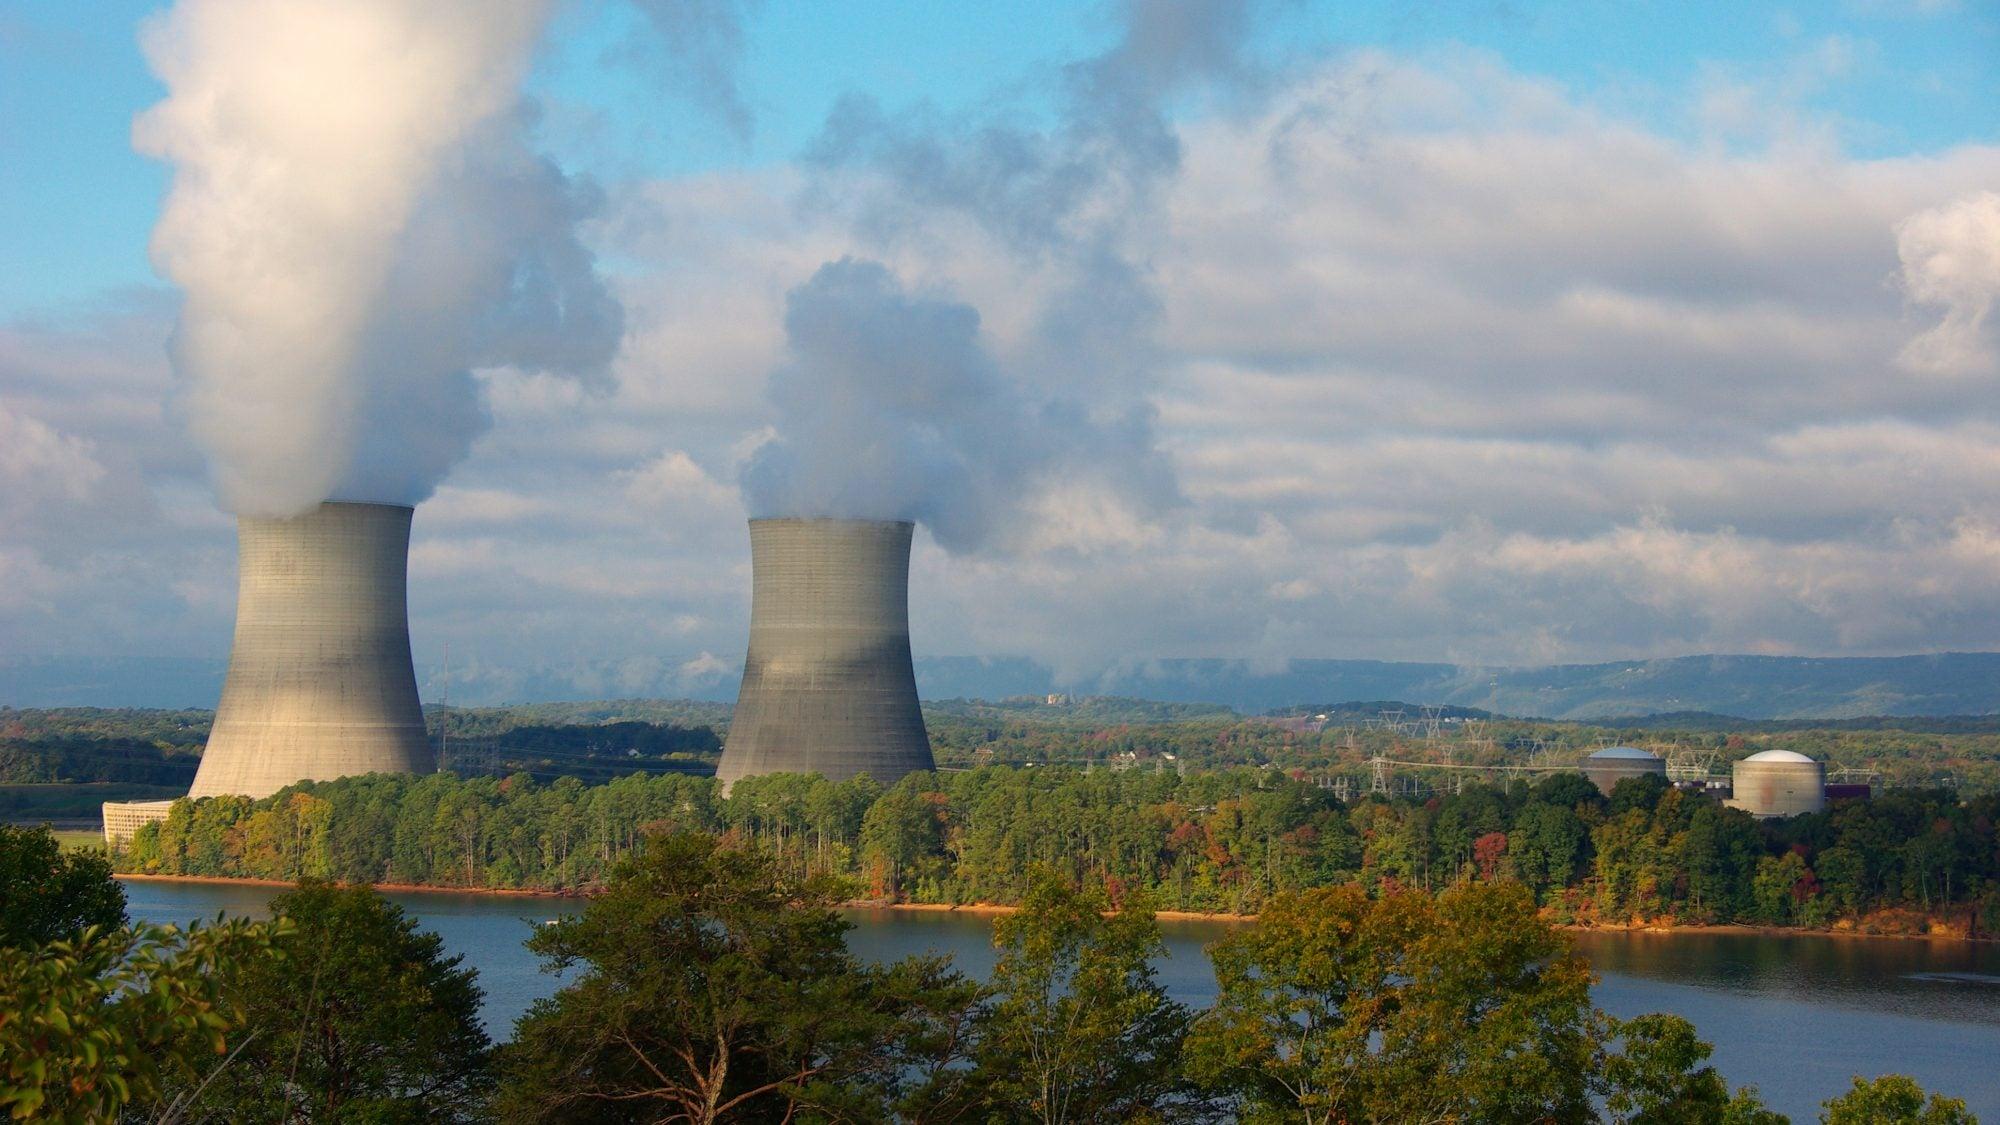 Sequoyah Nuclear Power Plant